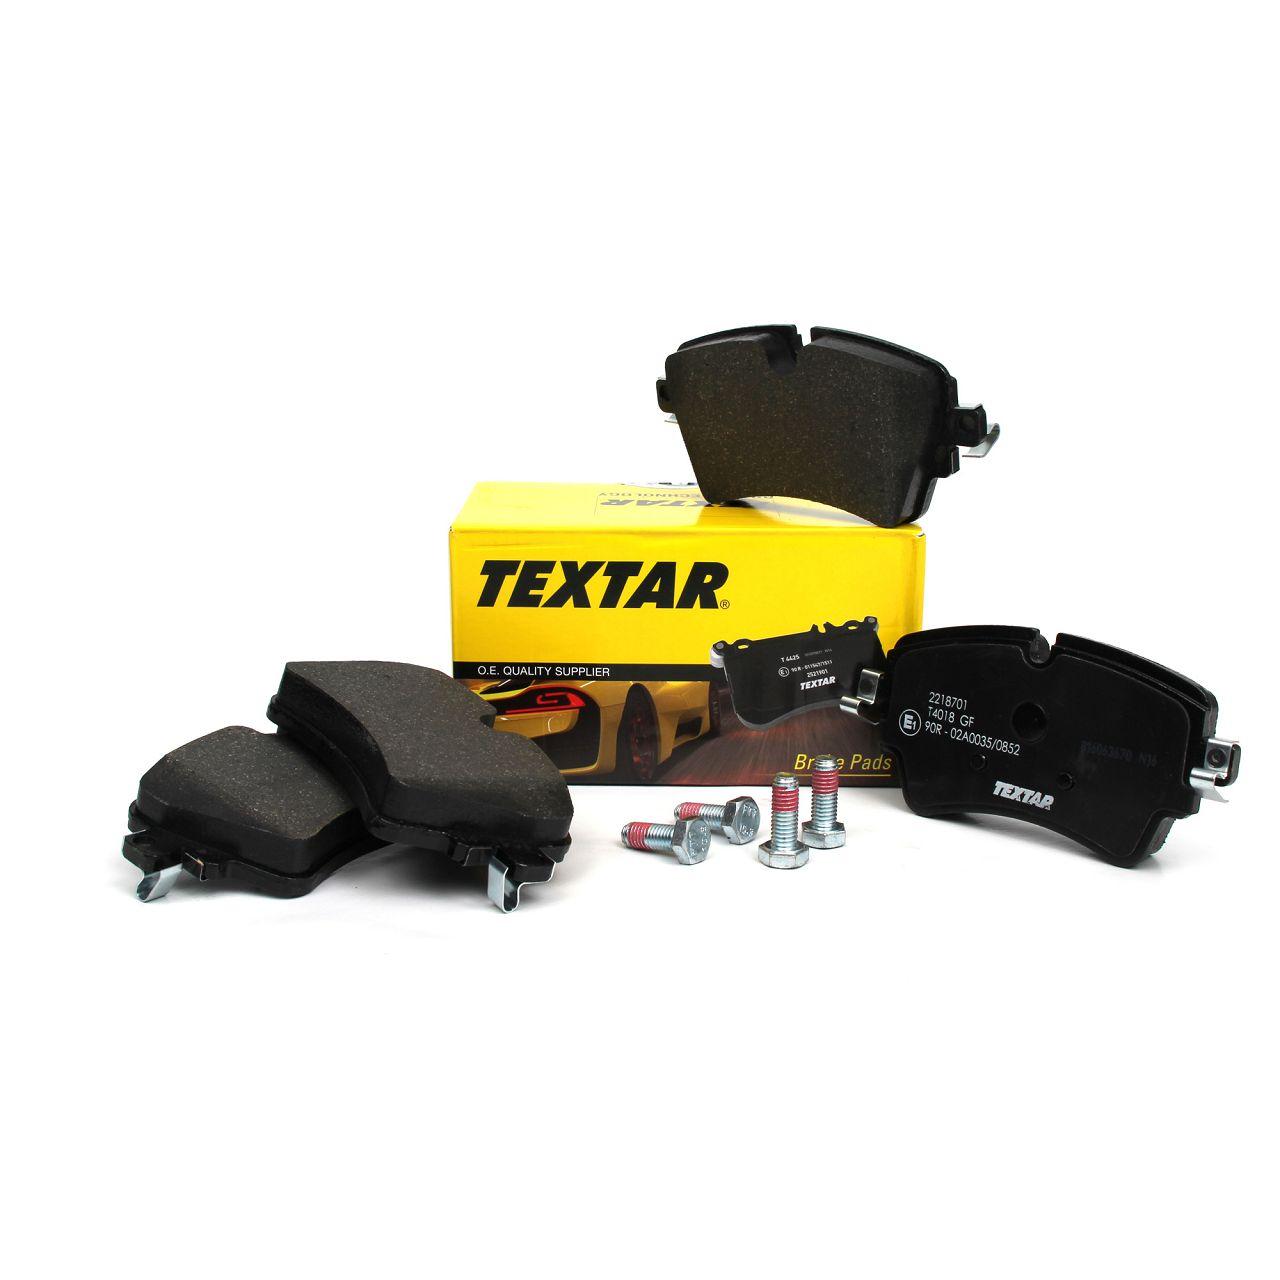 TEXTAR Bremsbeläge Bremsbelagsatz für BMW 2er F45 F46 Mini F55 F56 F57 F54 vorne